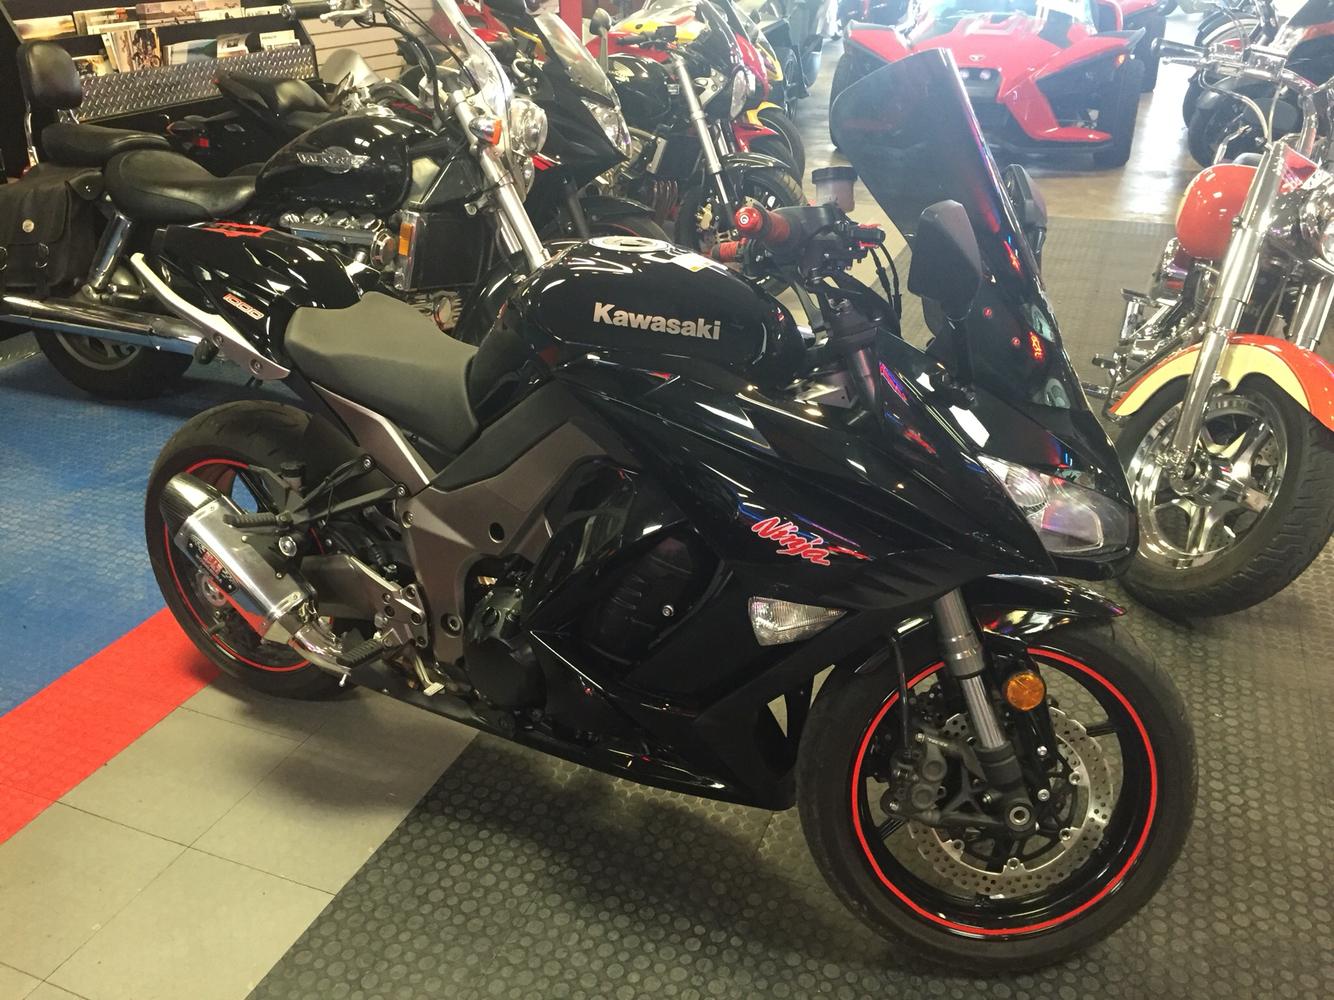 $6,999, 2011 Kawasaki Ninja 1000